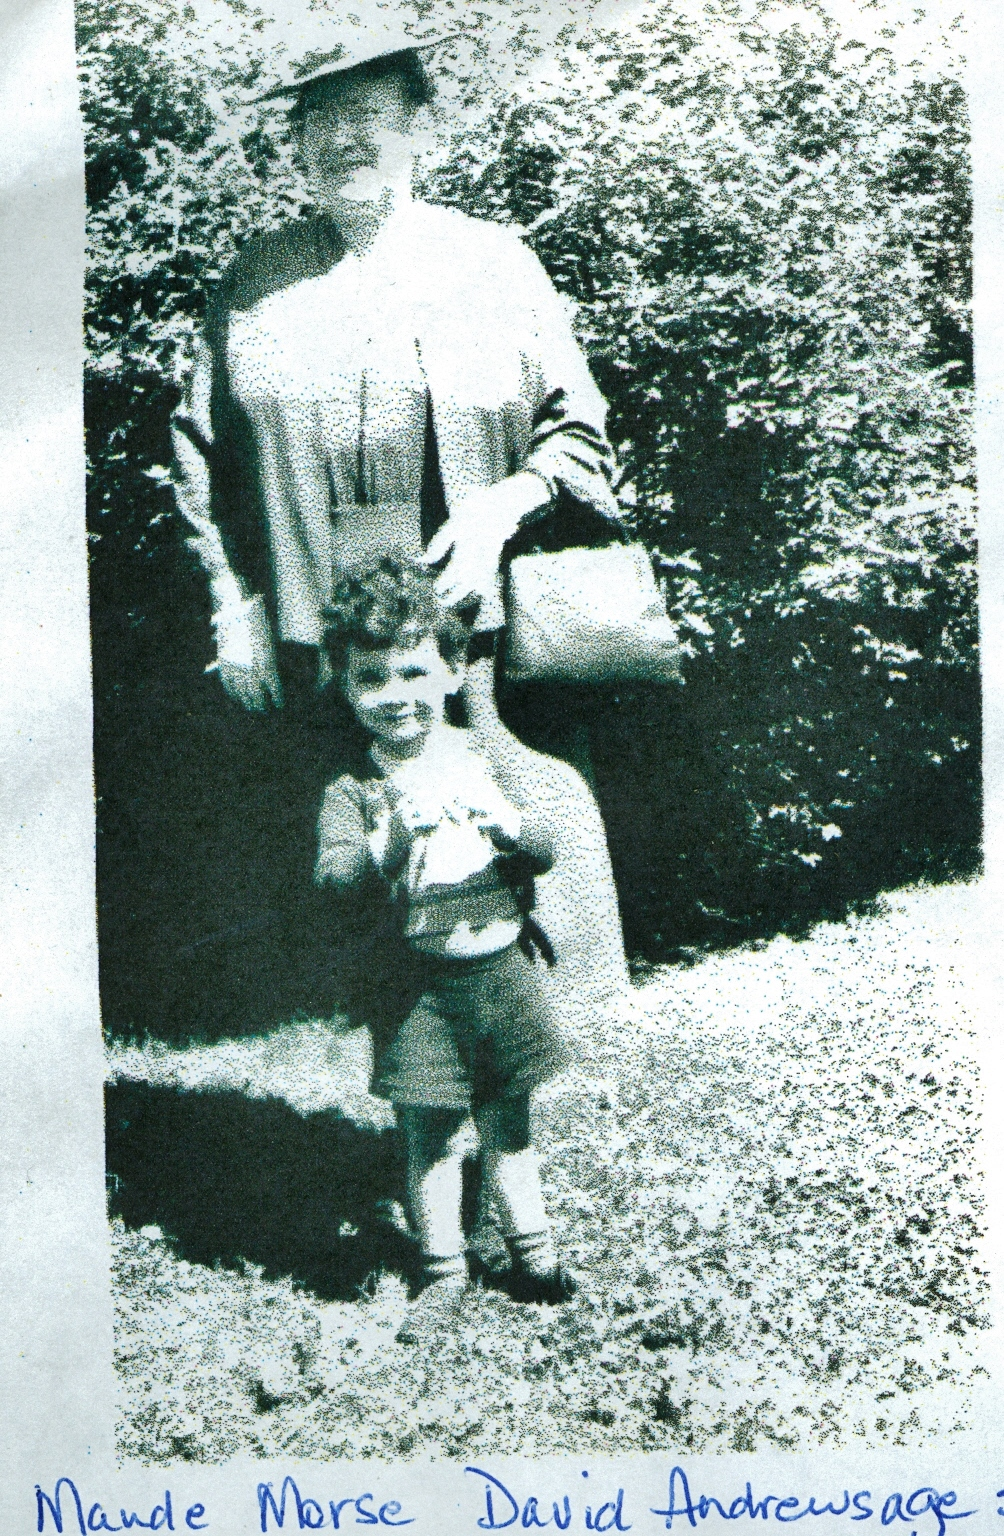 Maude Morse, David Andrews (3)